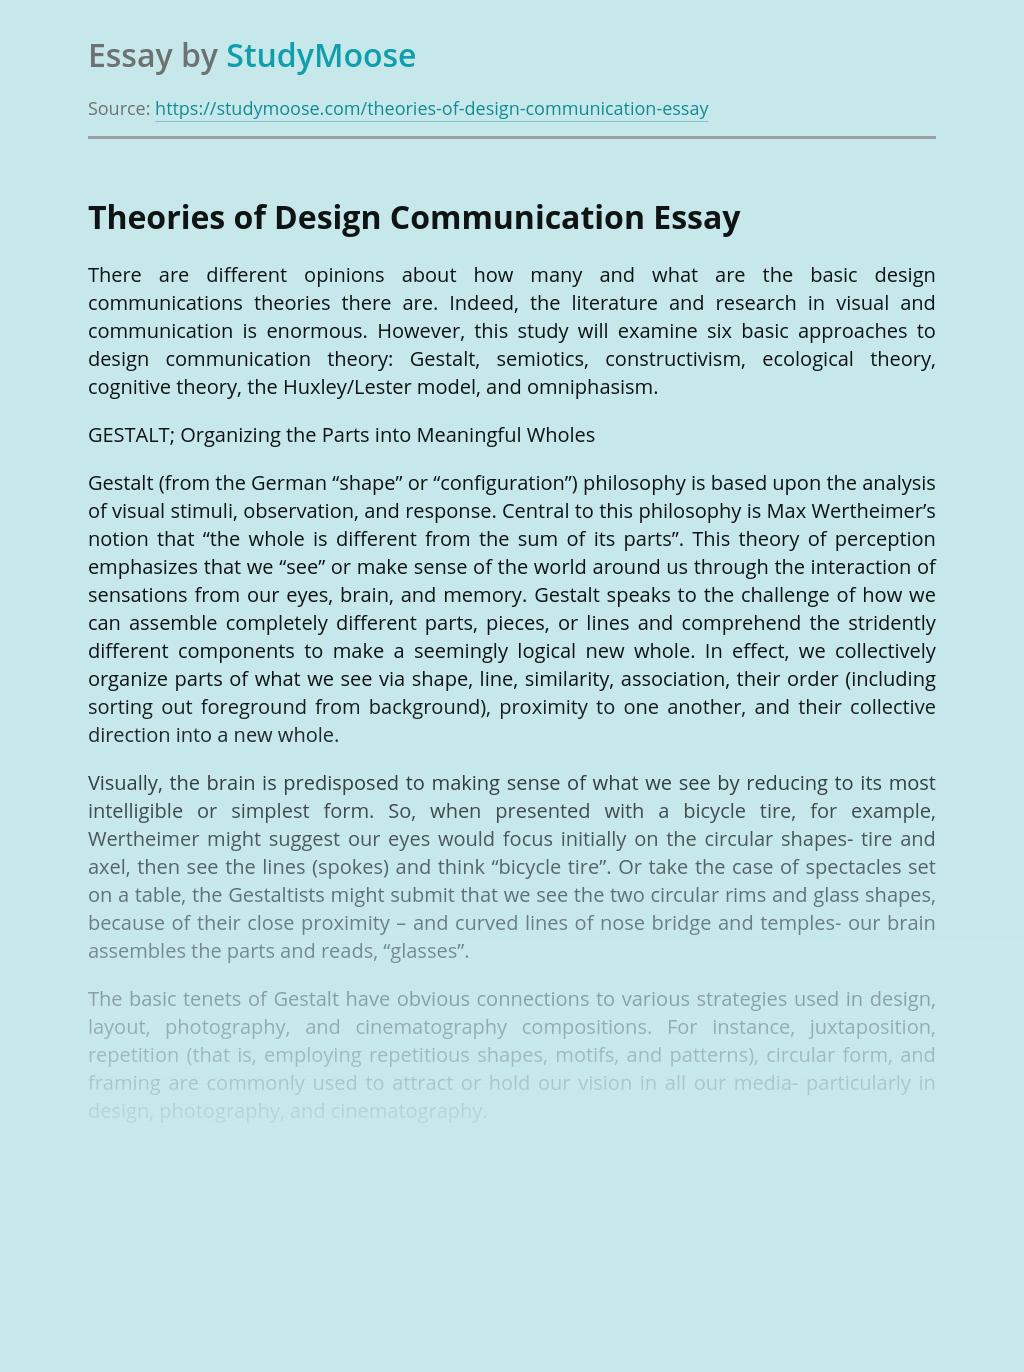 Theories of Design Communication